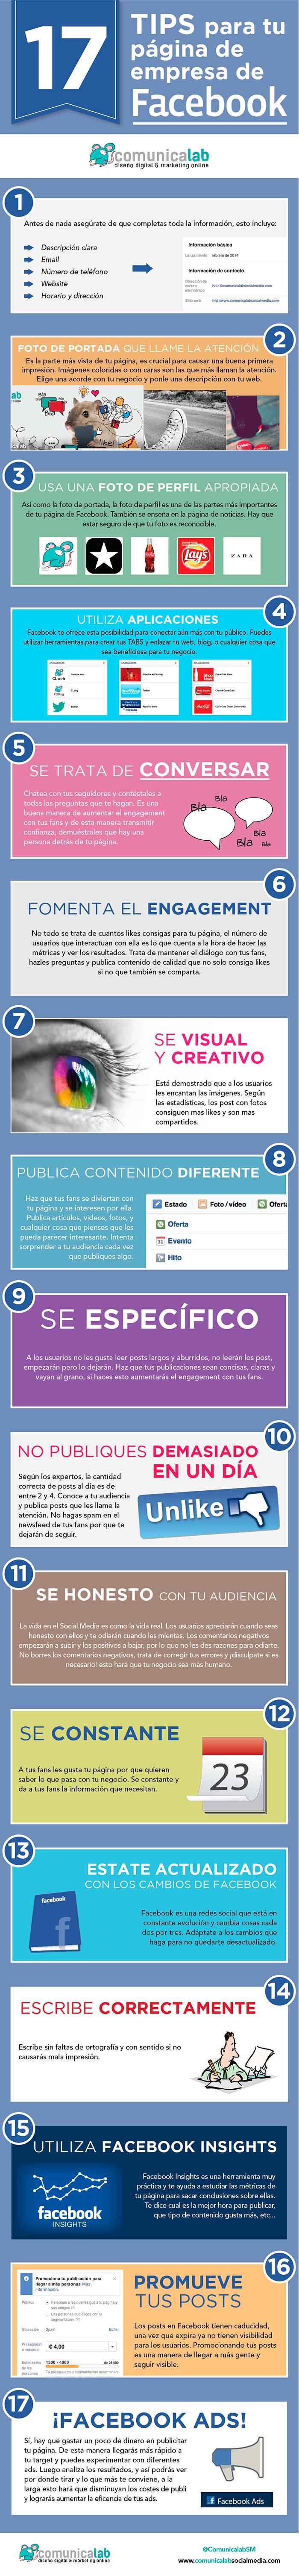 Infografia sobre tips para vuestra pagina de empresa en Facebook